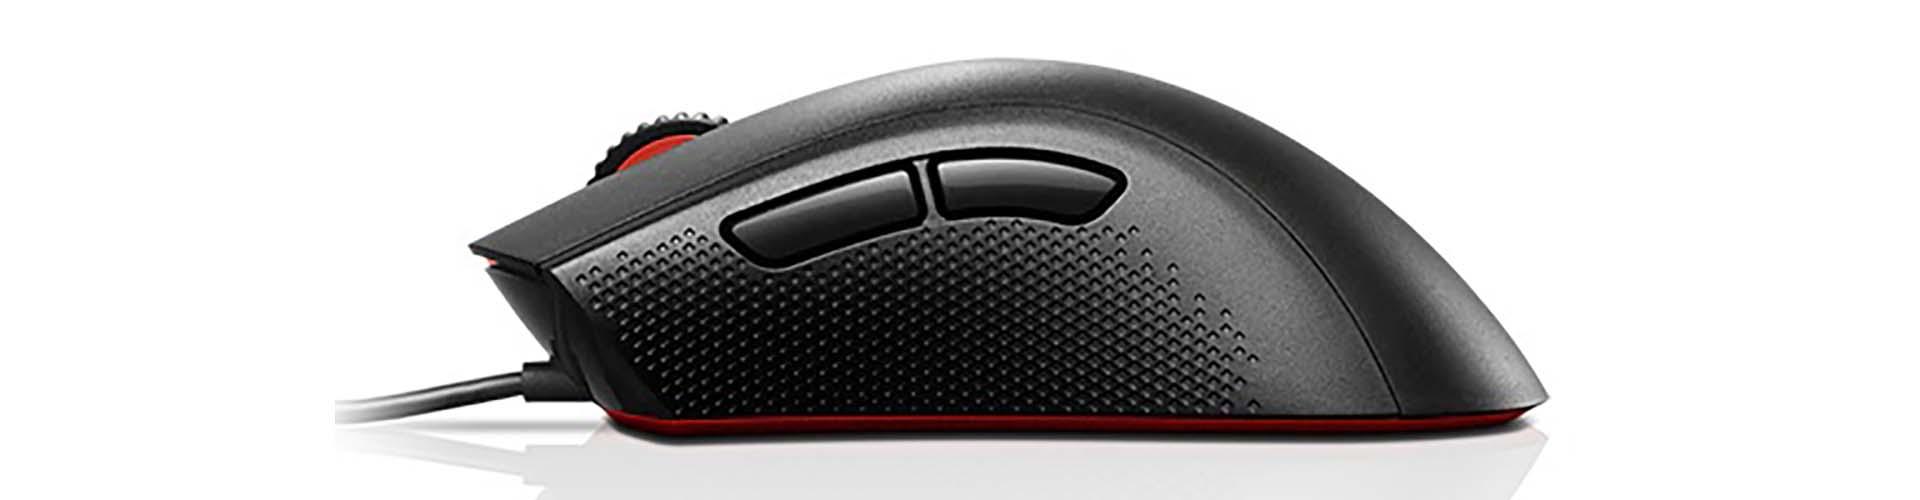 Staff Product Review: GX30L02674 – Lenovo Legion Y Optical Gaming